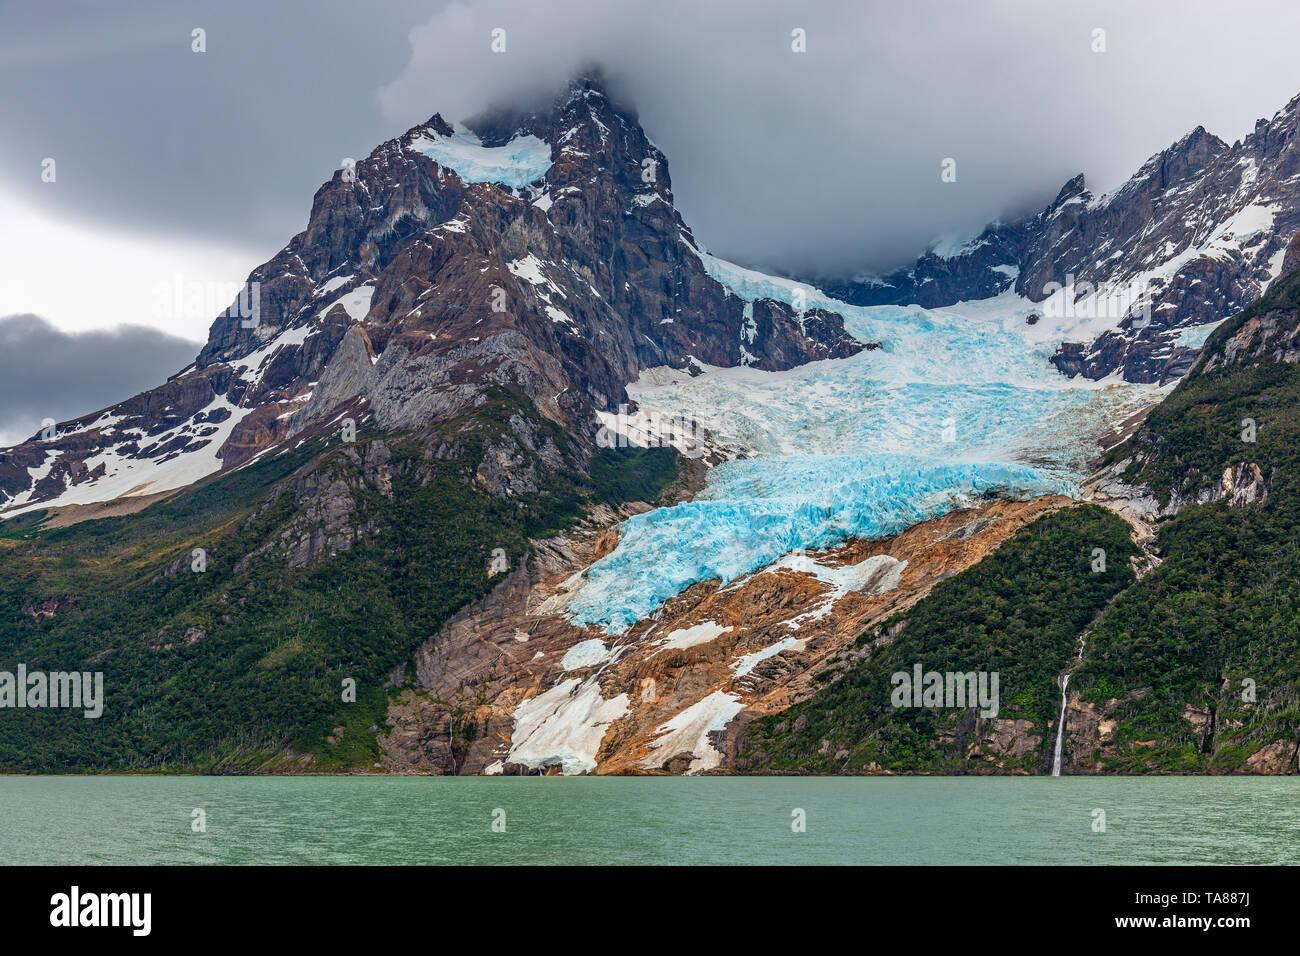 Balmaceda peak and glacier, Last Hope Sound or Fjord, Bernardo O'Higgins national park between Puerto Natales and Torres del Paine, Patagonia, Chile. - Stock Image